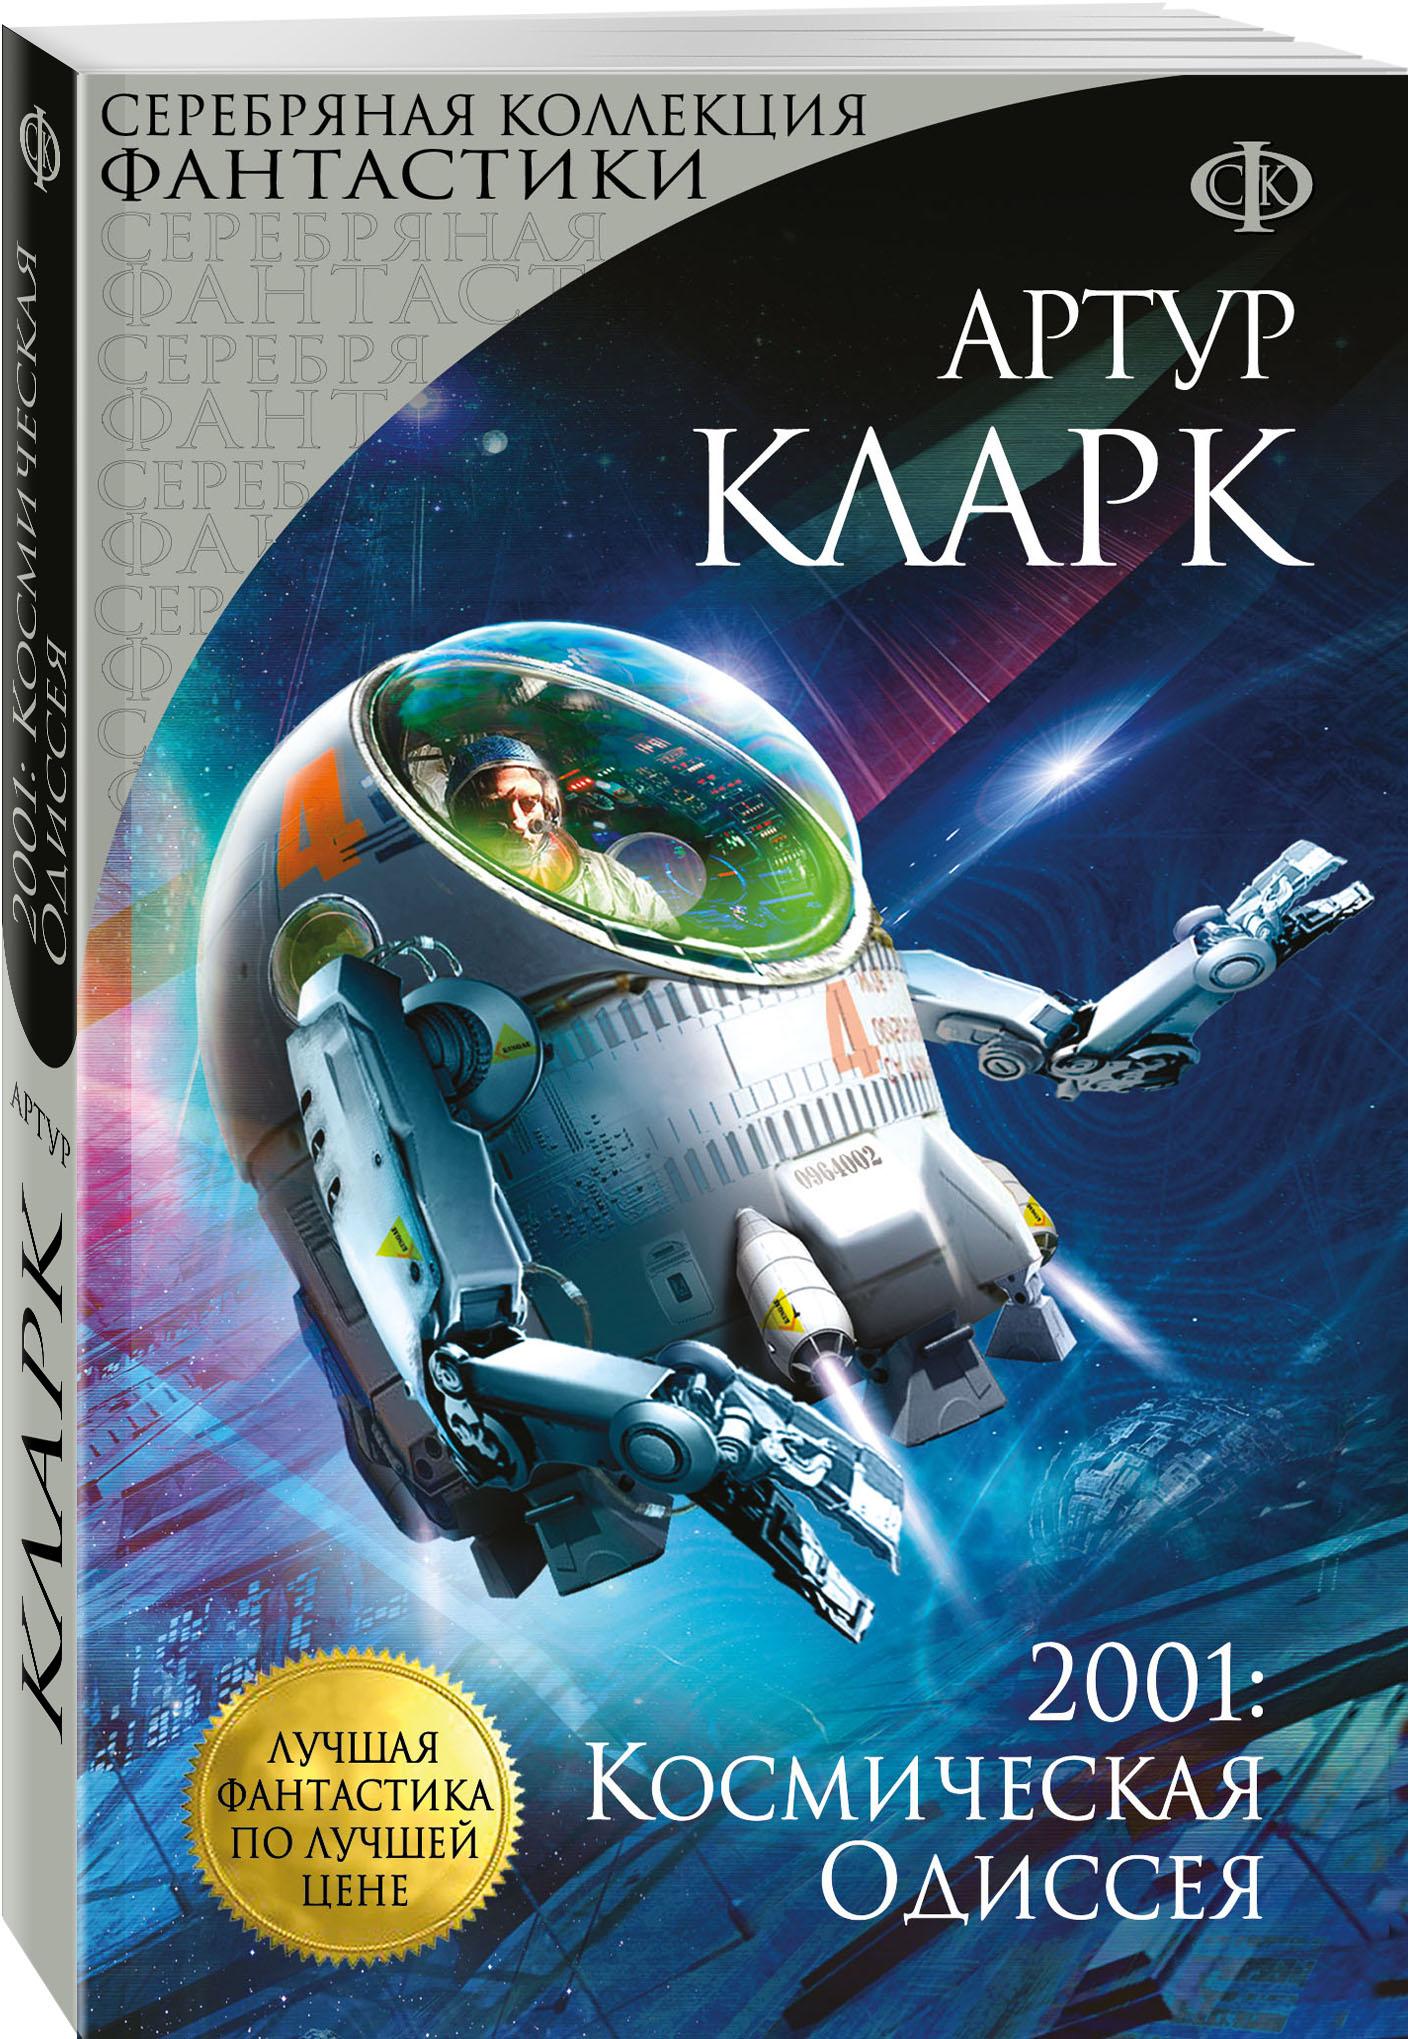 Артур Кларк 2001: Космическая Одиссея кларк артур чарлз 2001 космическая одиссея